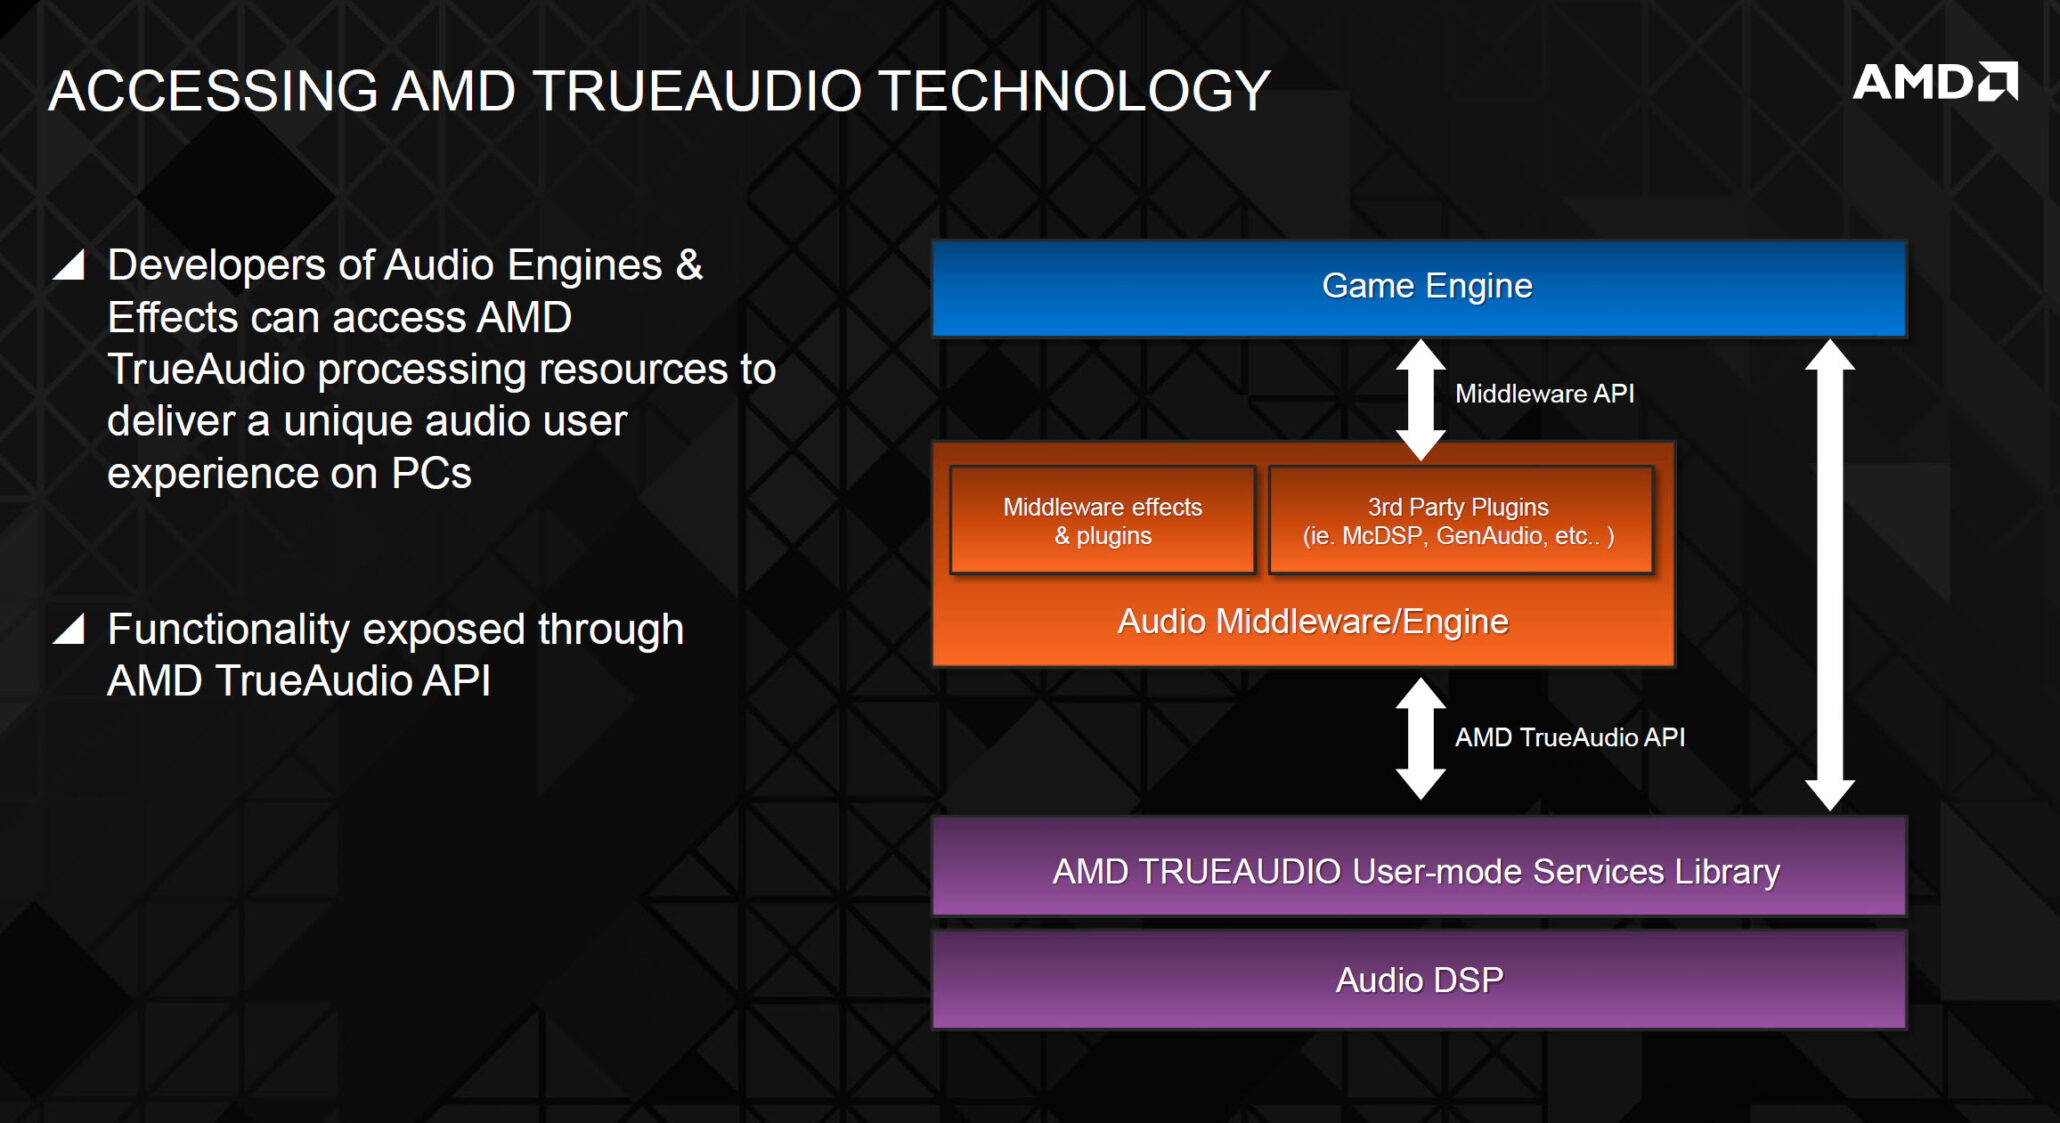 amd-true-audio-access